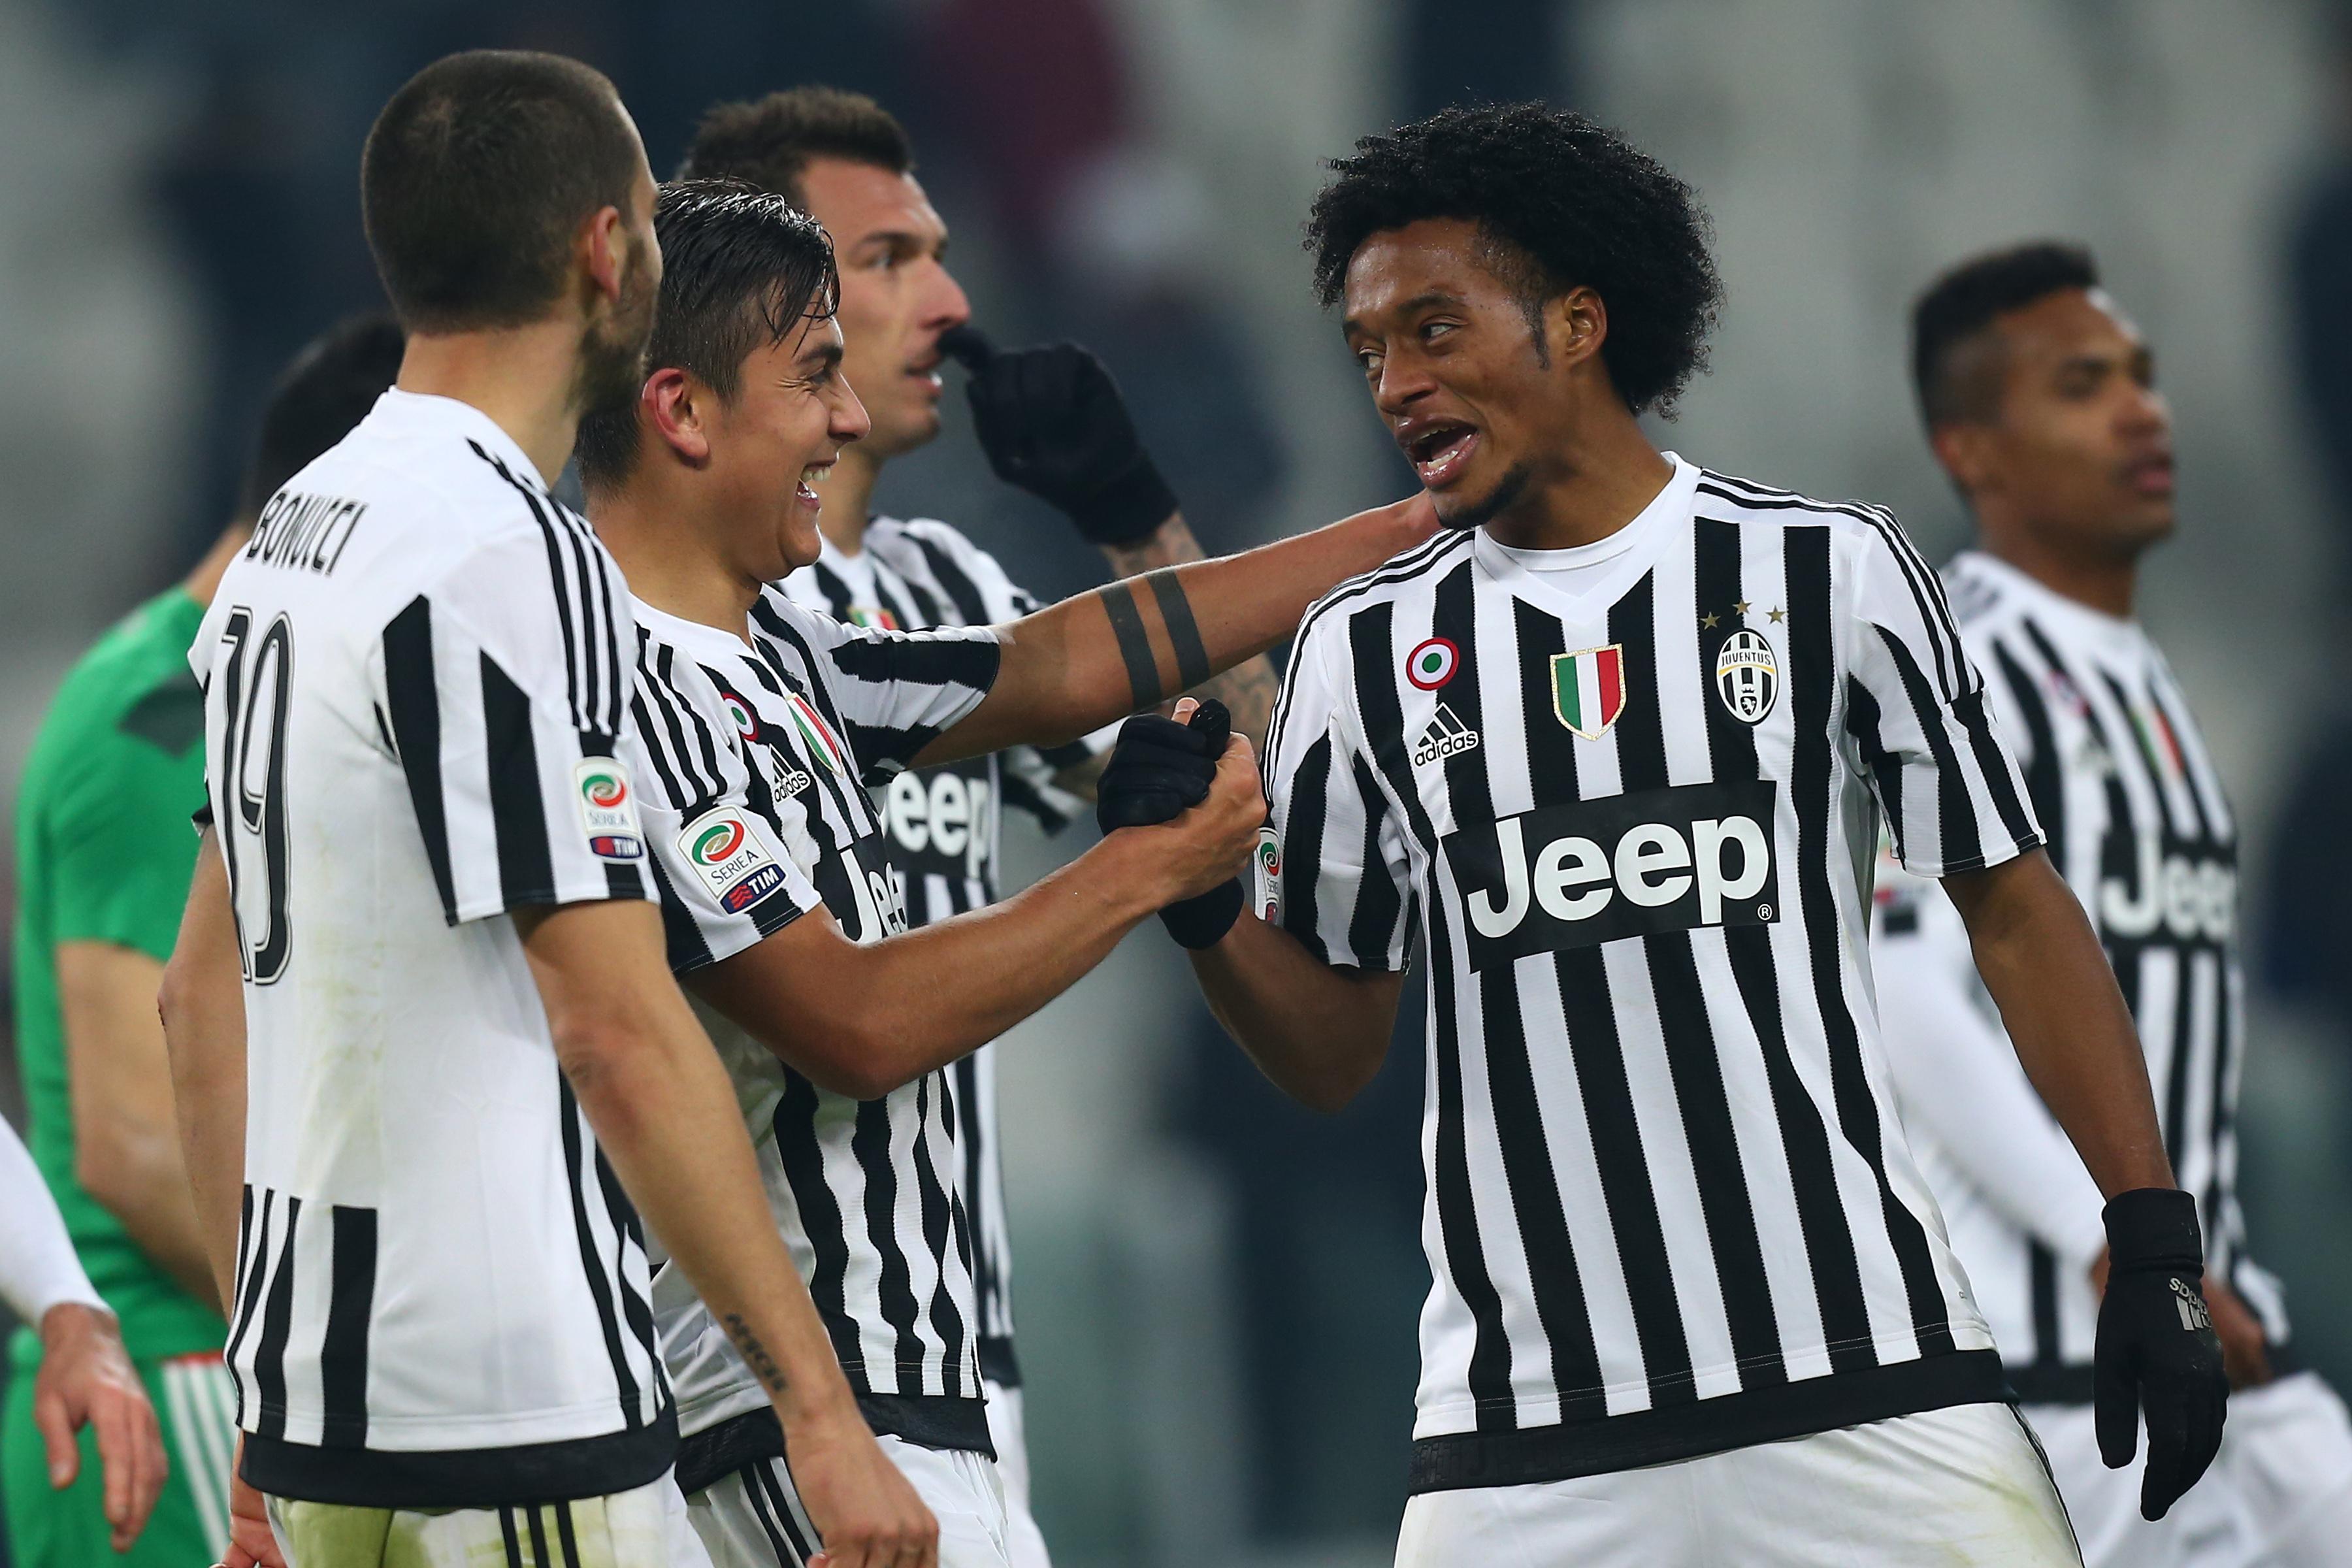 El spot de Navidad de la Juventus